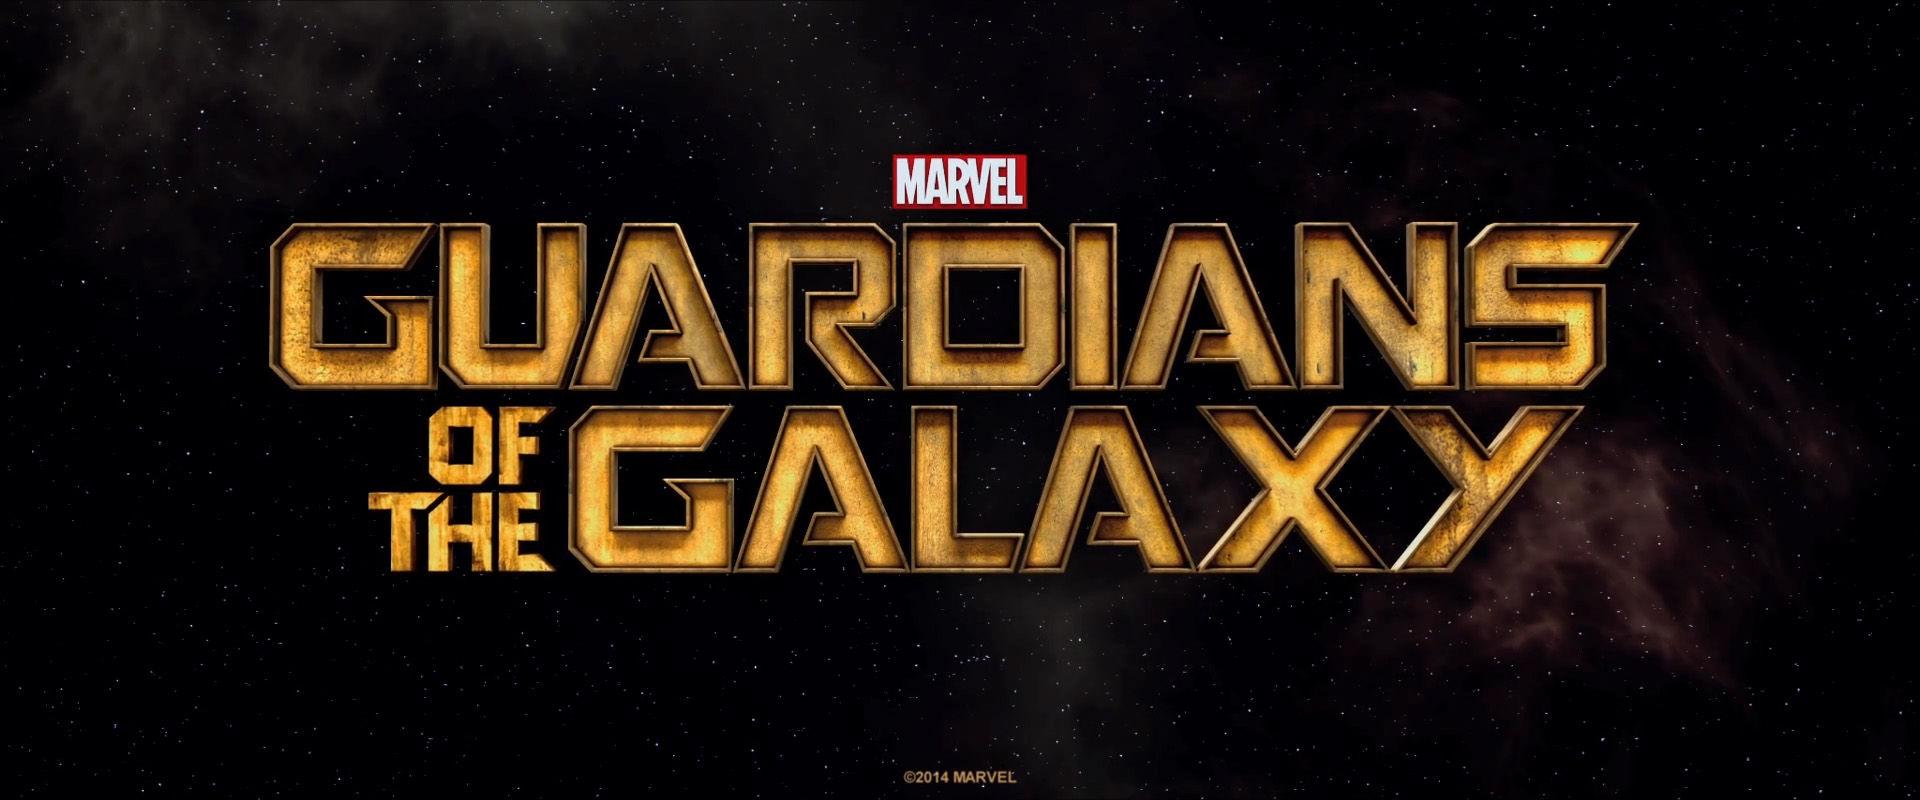 Guardians-of-the-Galaxy-Trailer-Logo.jpg